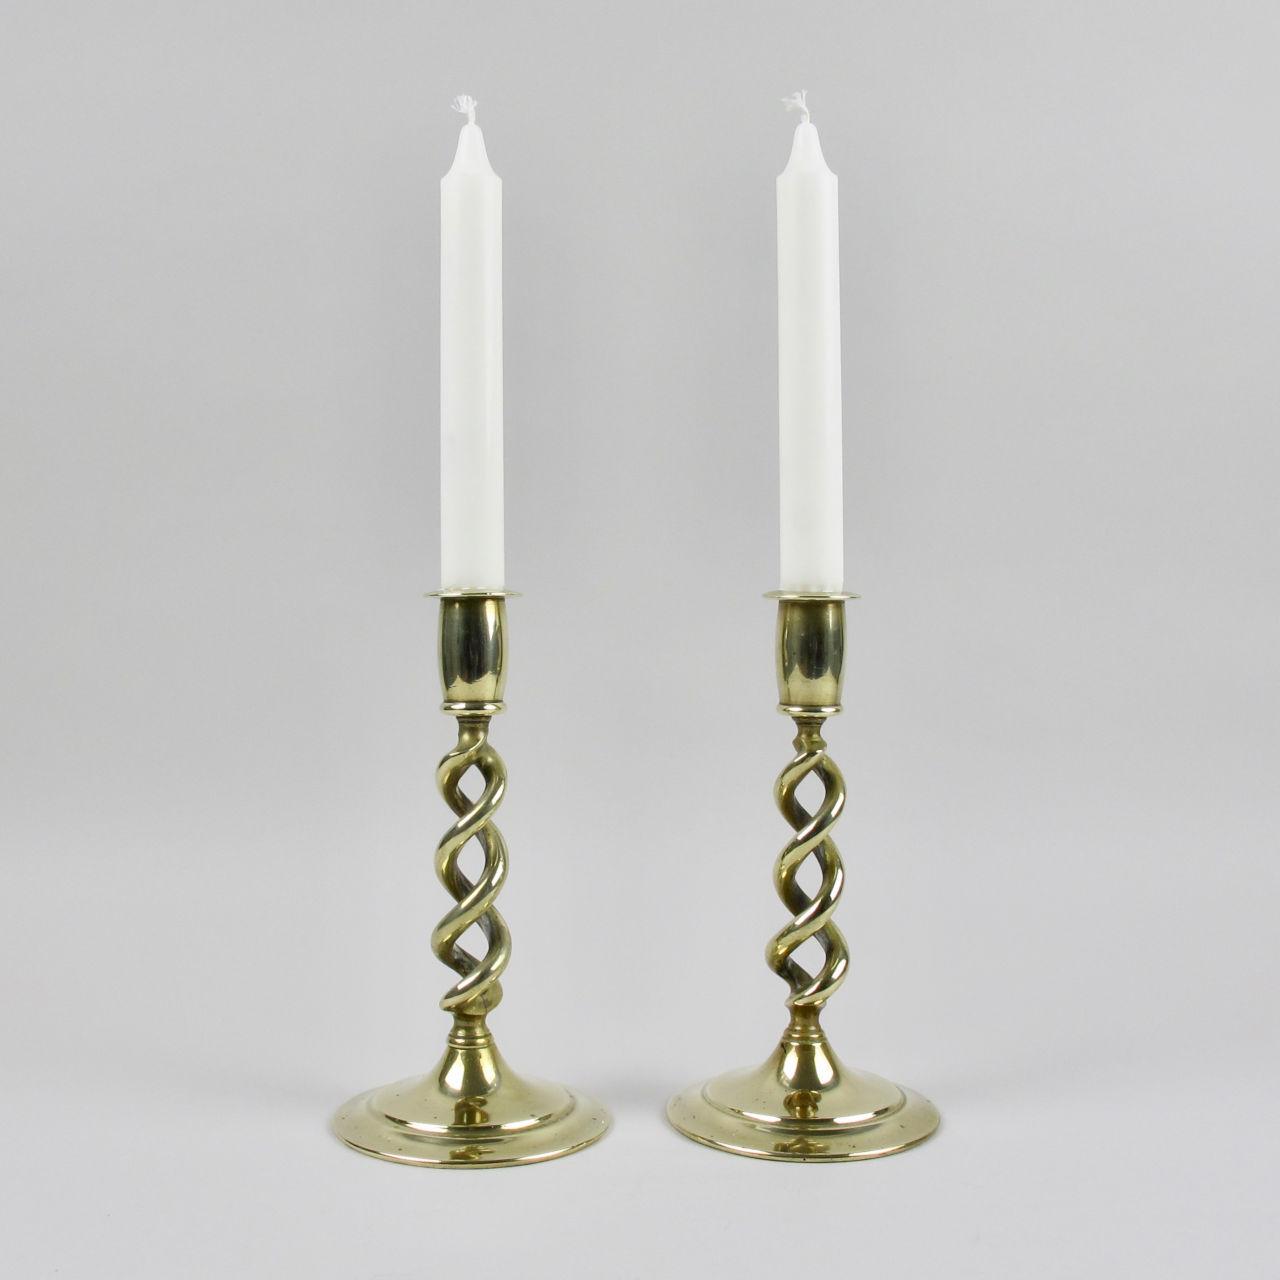 Pair of Brass Short Twist Stem Candlesticks